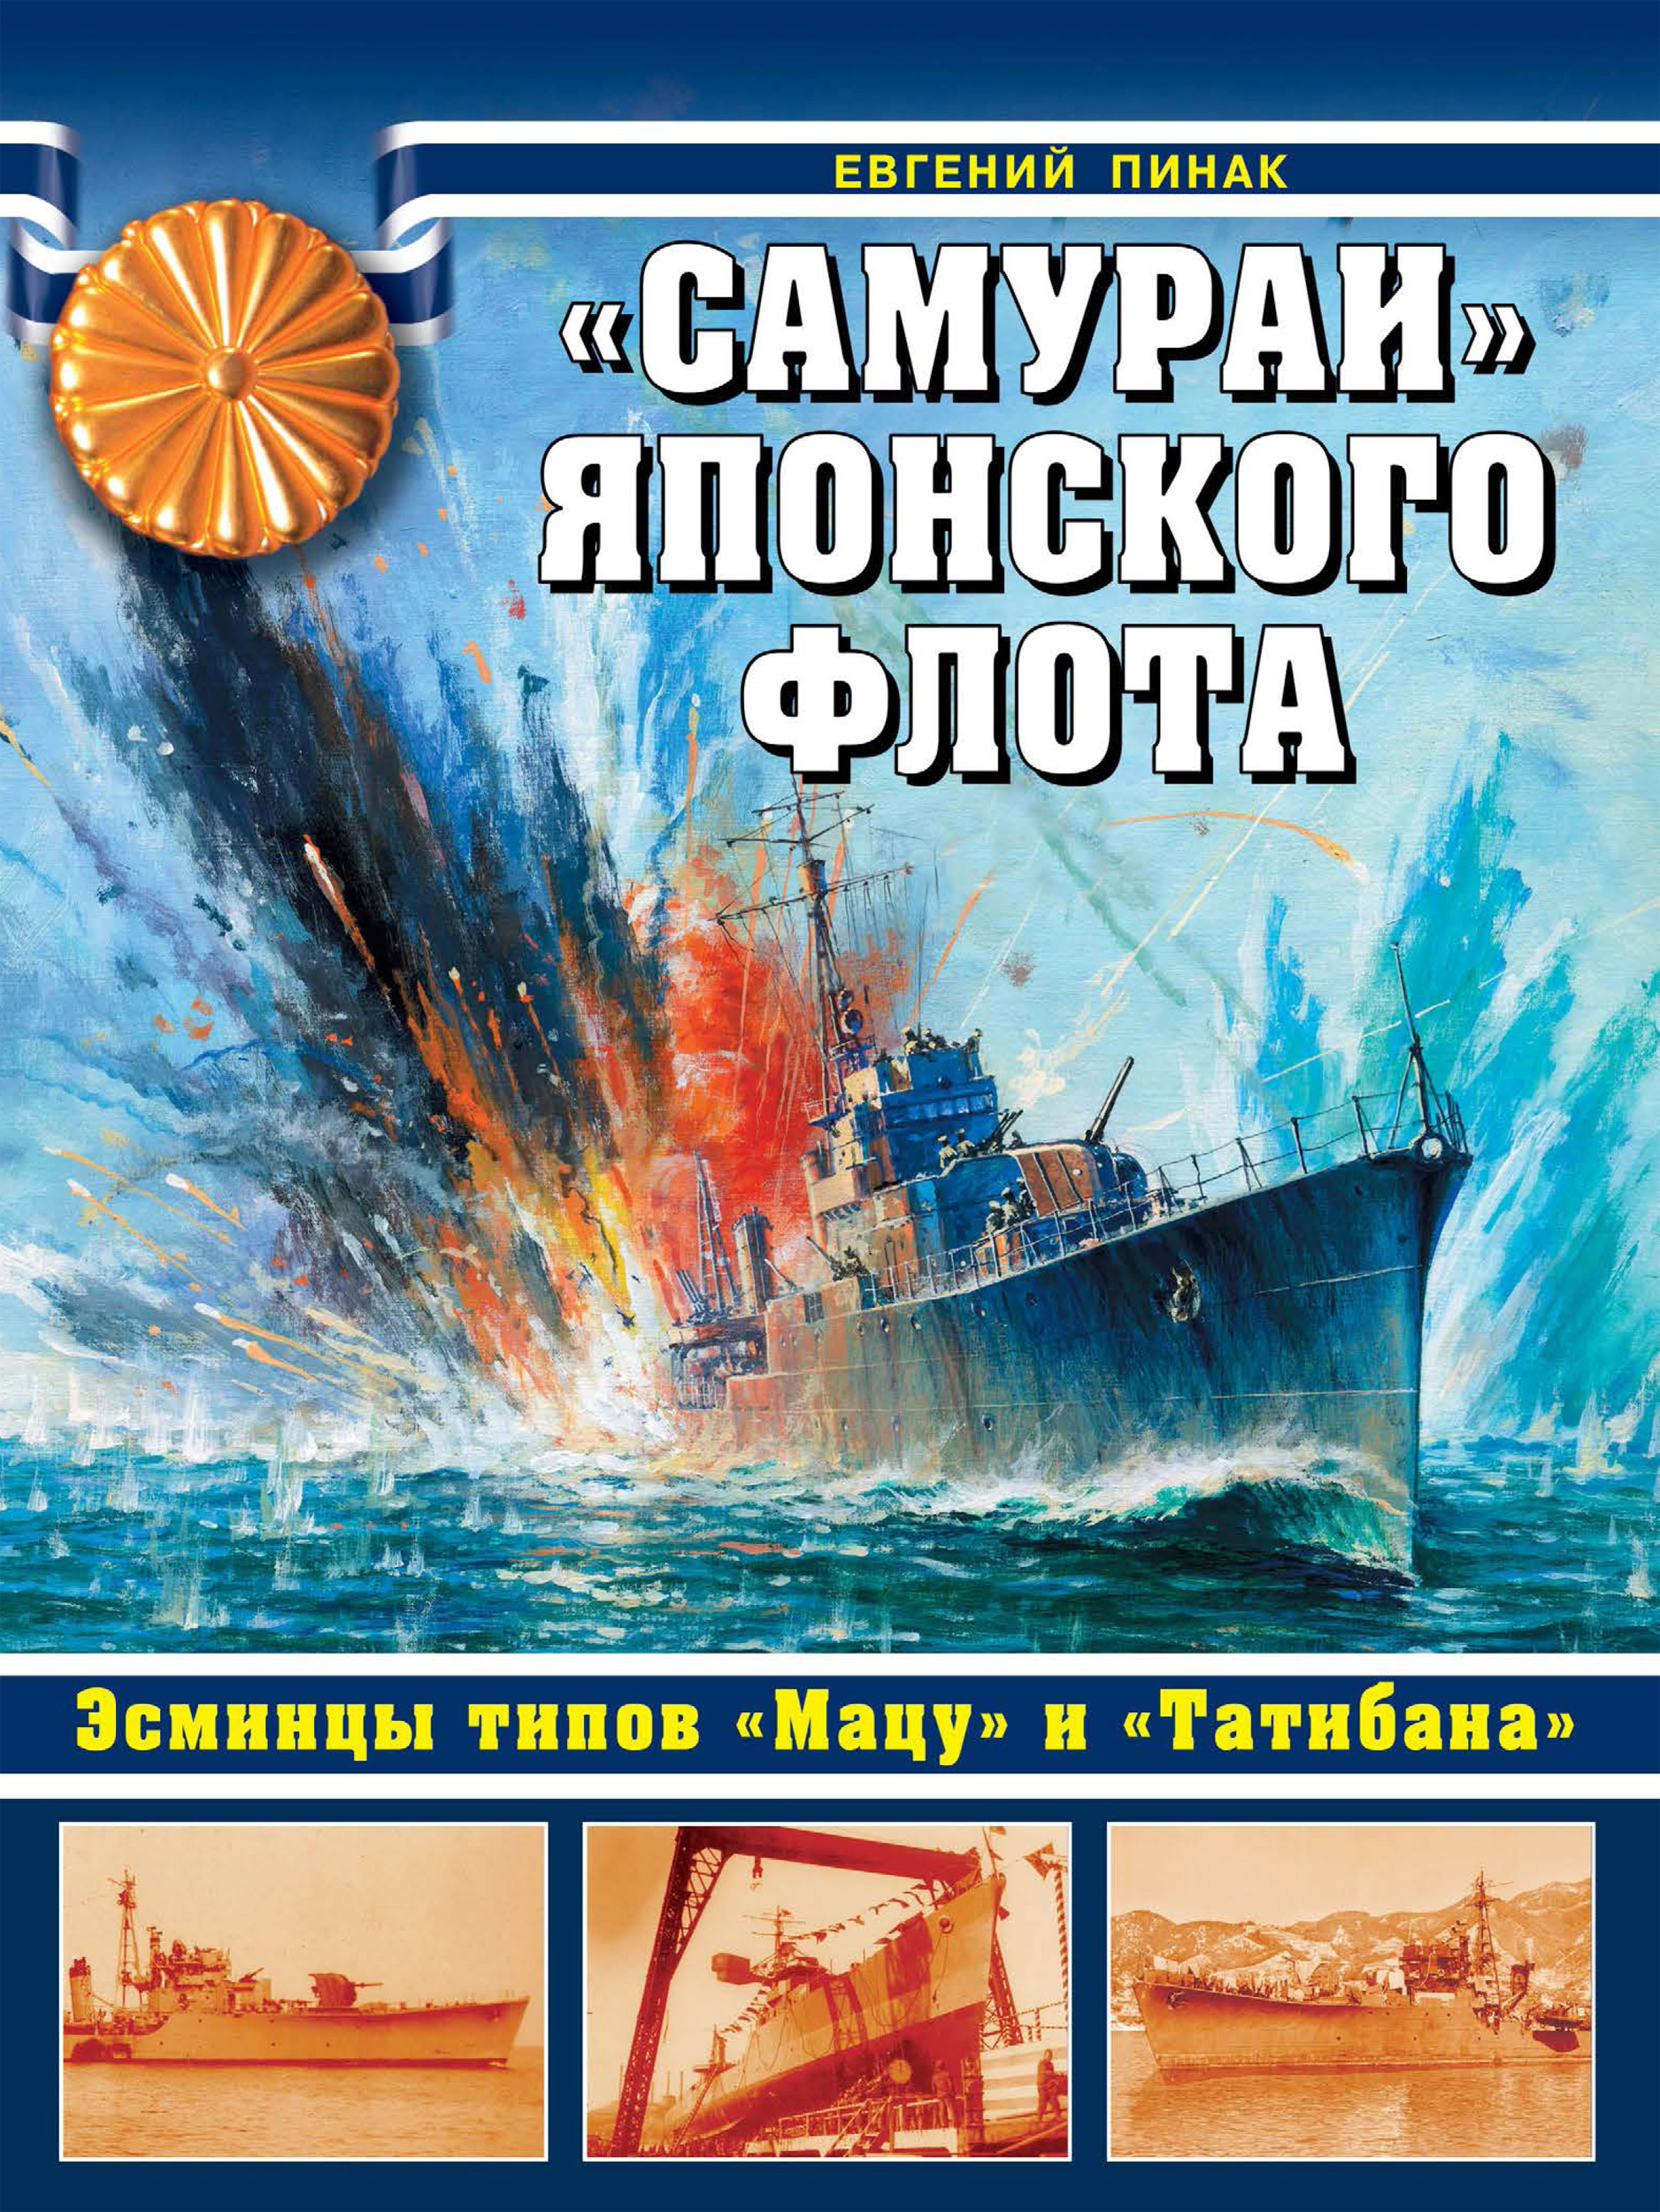 Евгений Пинак «Самураи» японского флота. Эсминцы типов «Мацу» и «Татибана»